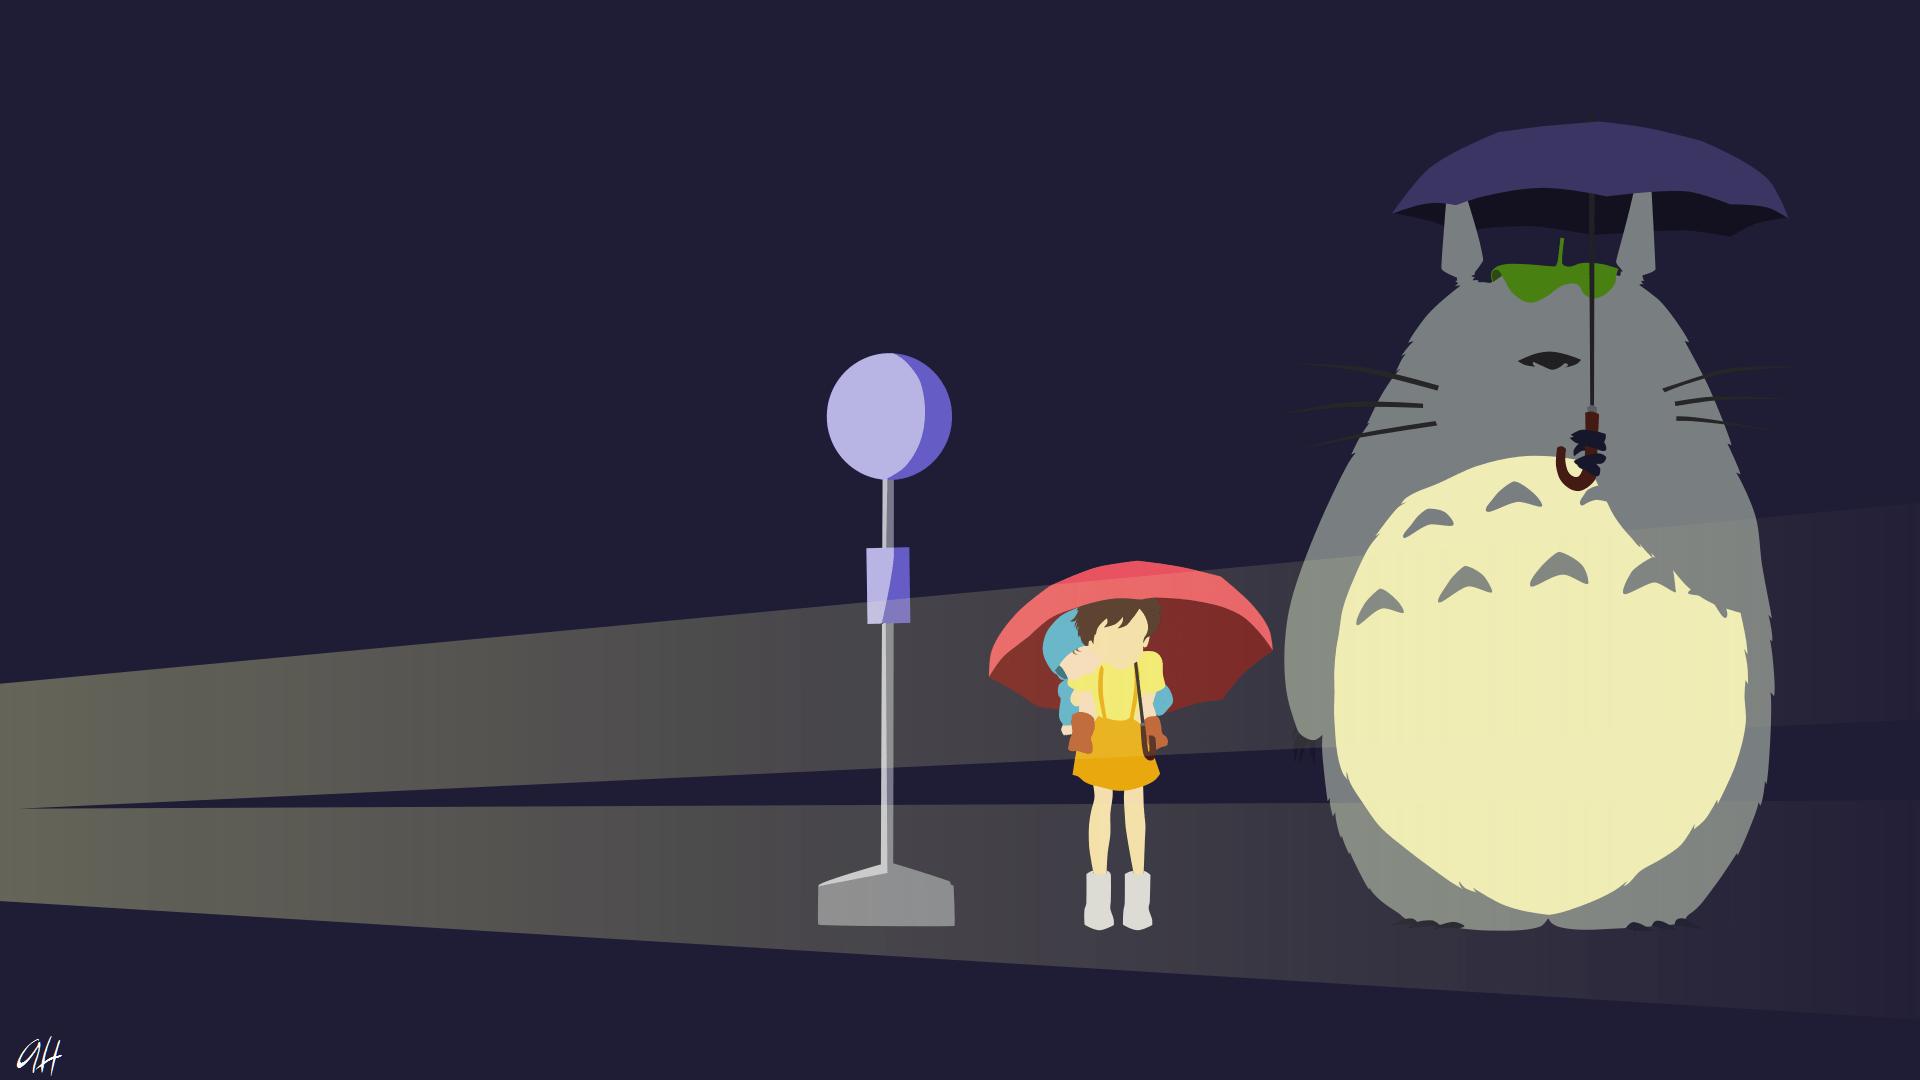 Stitch Cute Wallpaper For Computer My Neighbour Totoro Rain Scene Hd Wallpaper Background